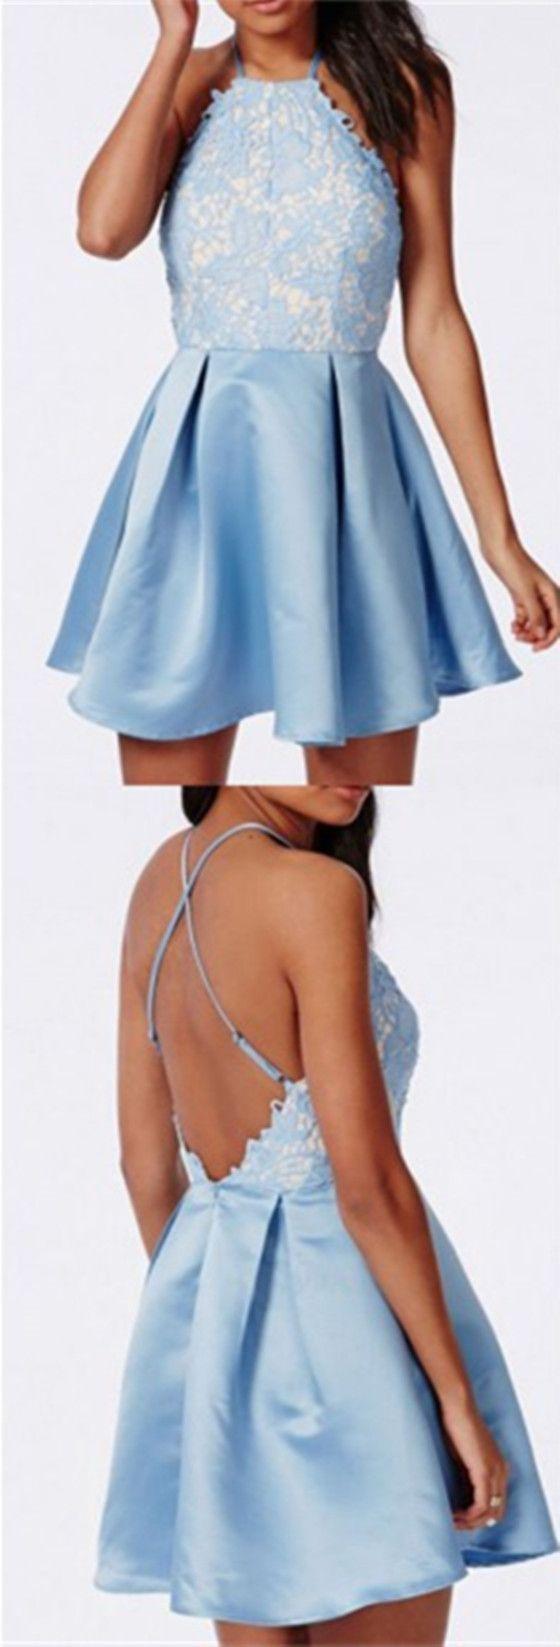 Aline sweetheart sleeveless simple cheap short homecoming dresses